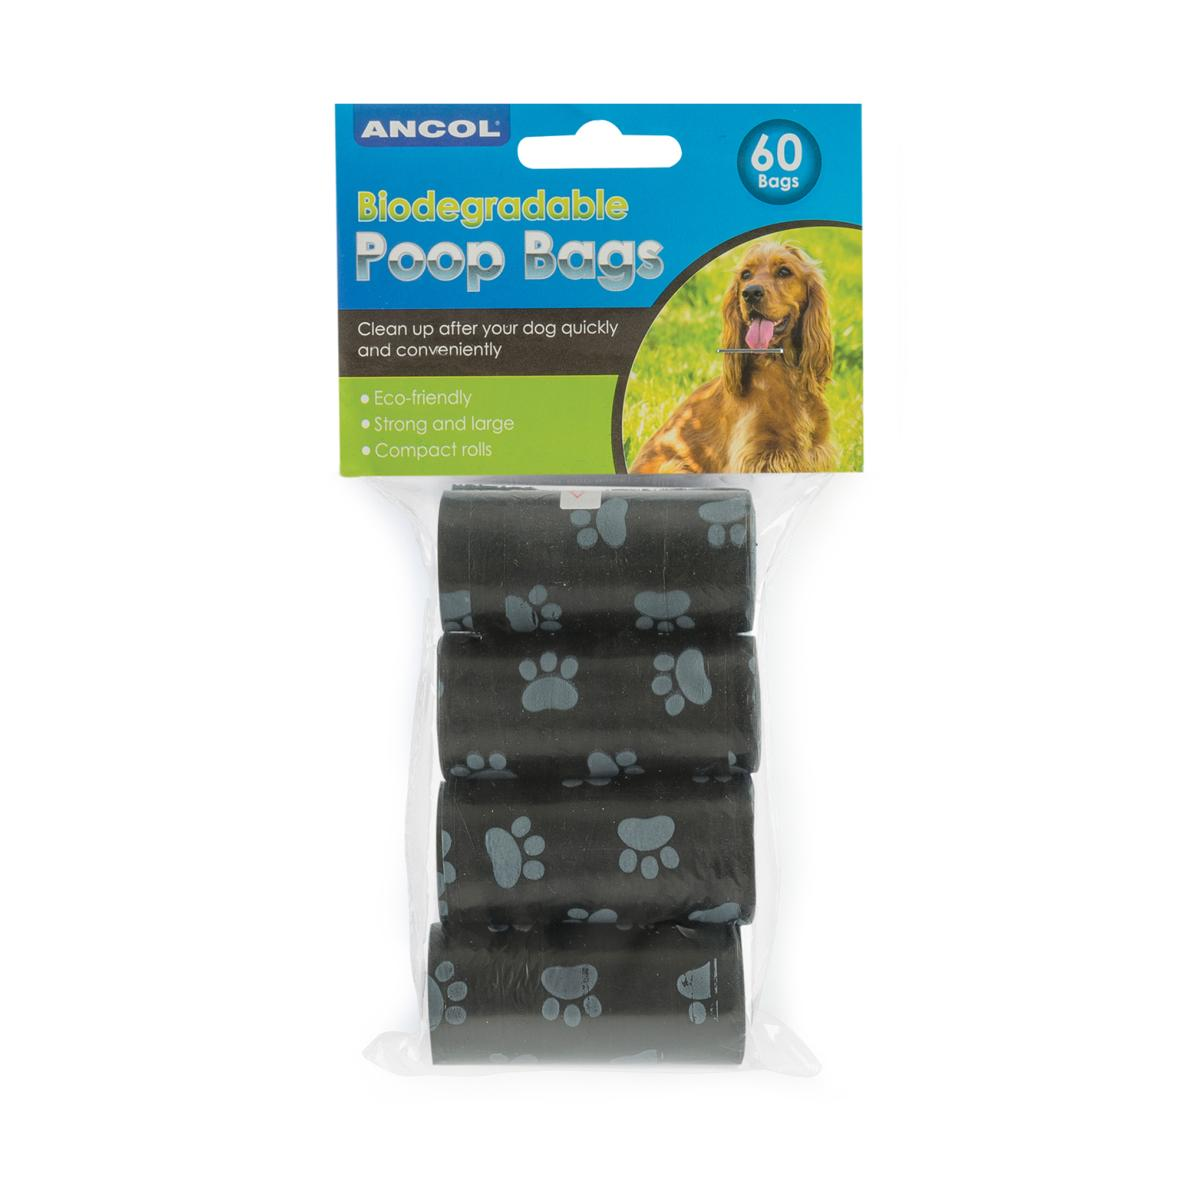 CLEARANCE ANCOL Biodegradable Poo Bag Rolls 60pcs